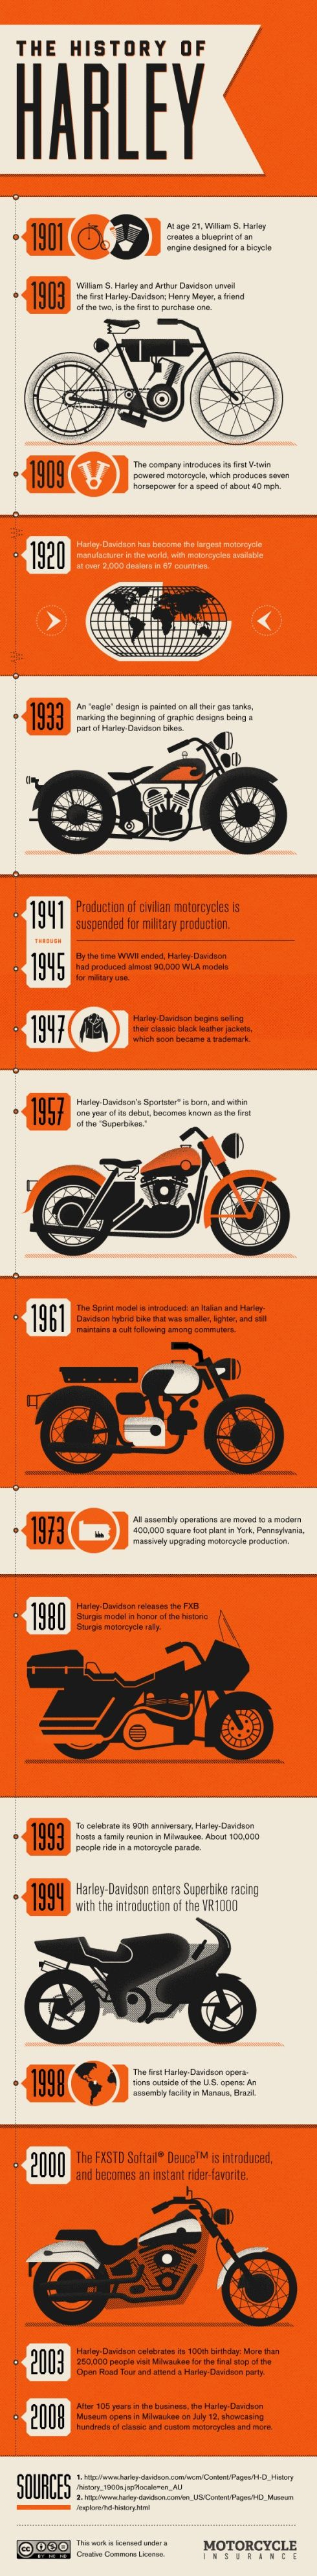 History of Harley: